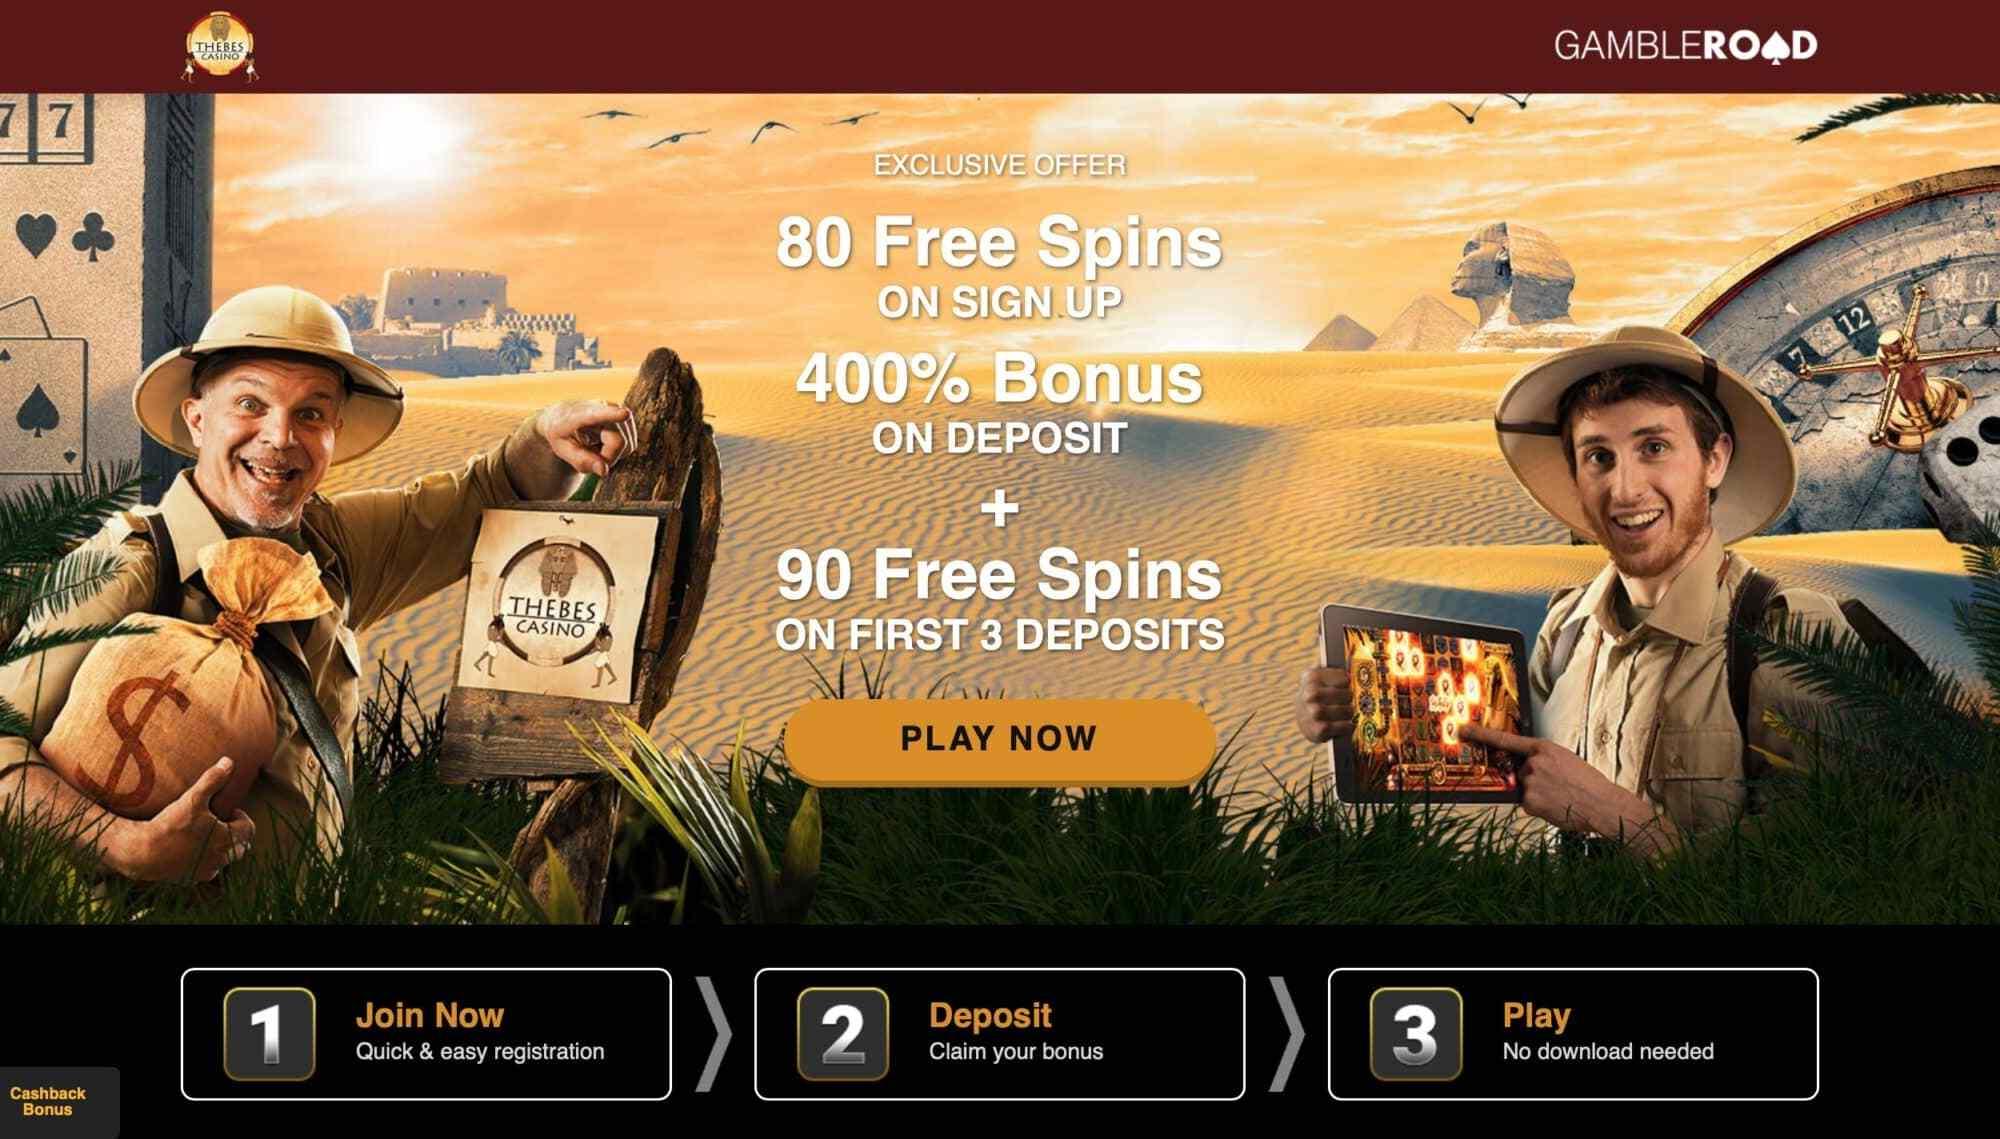 Thebes Casino: Get 80 Free Spins + 400% Deposit Bonus